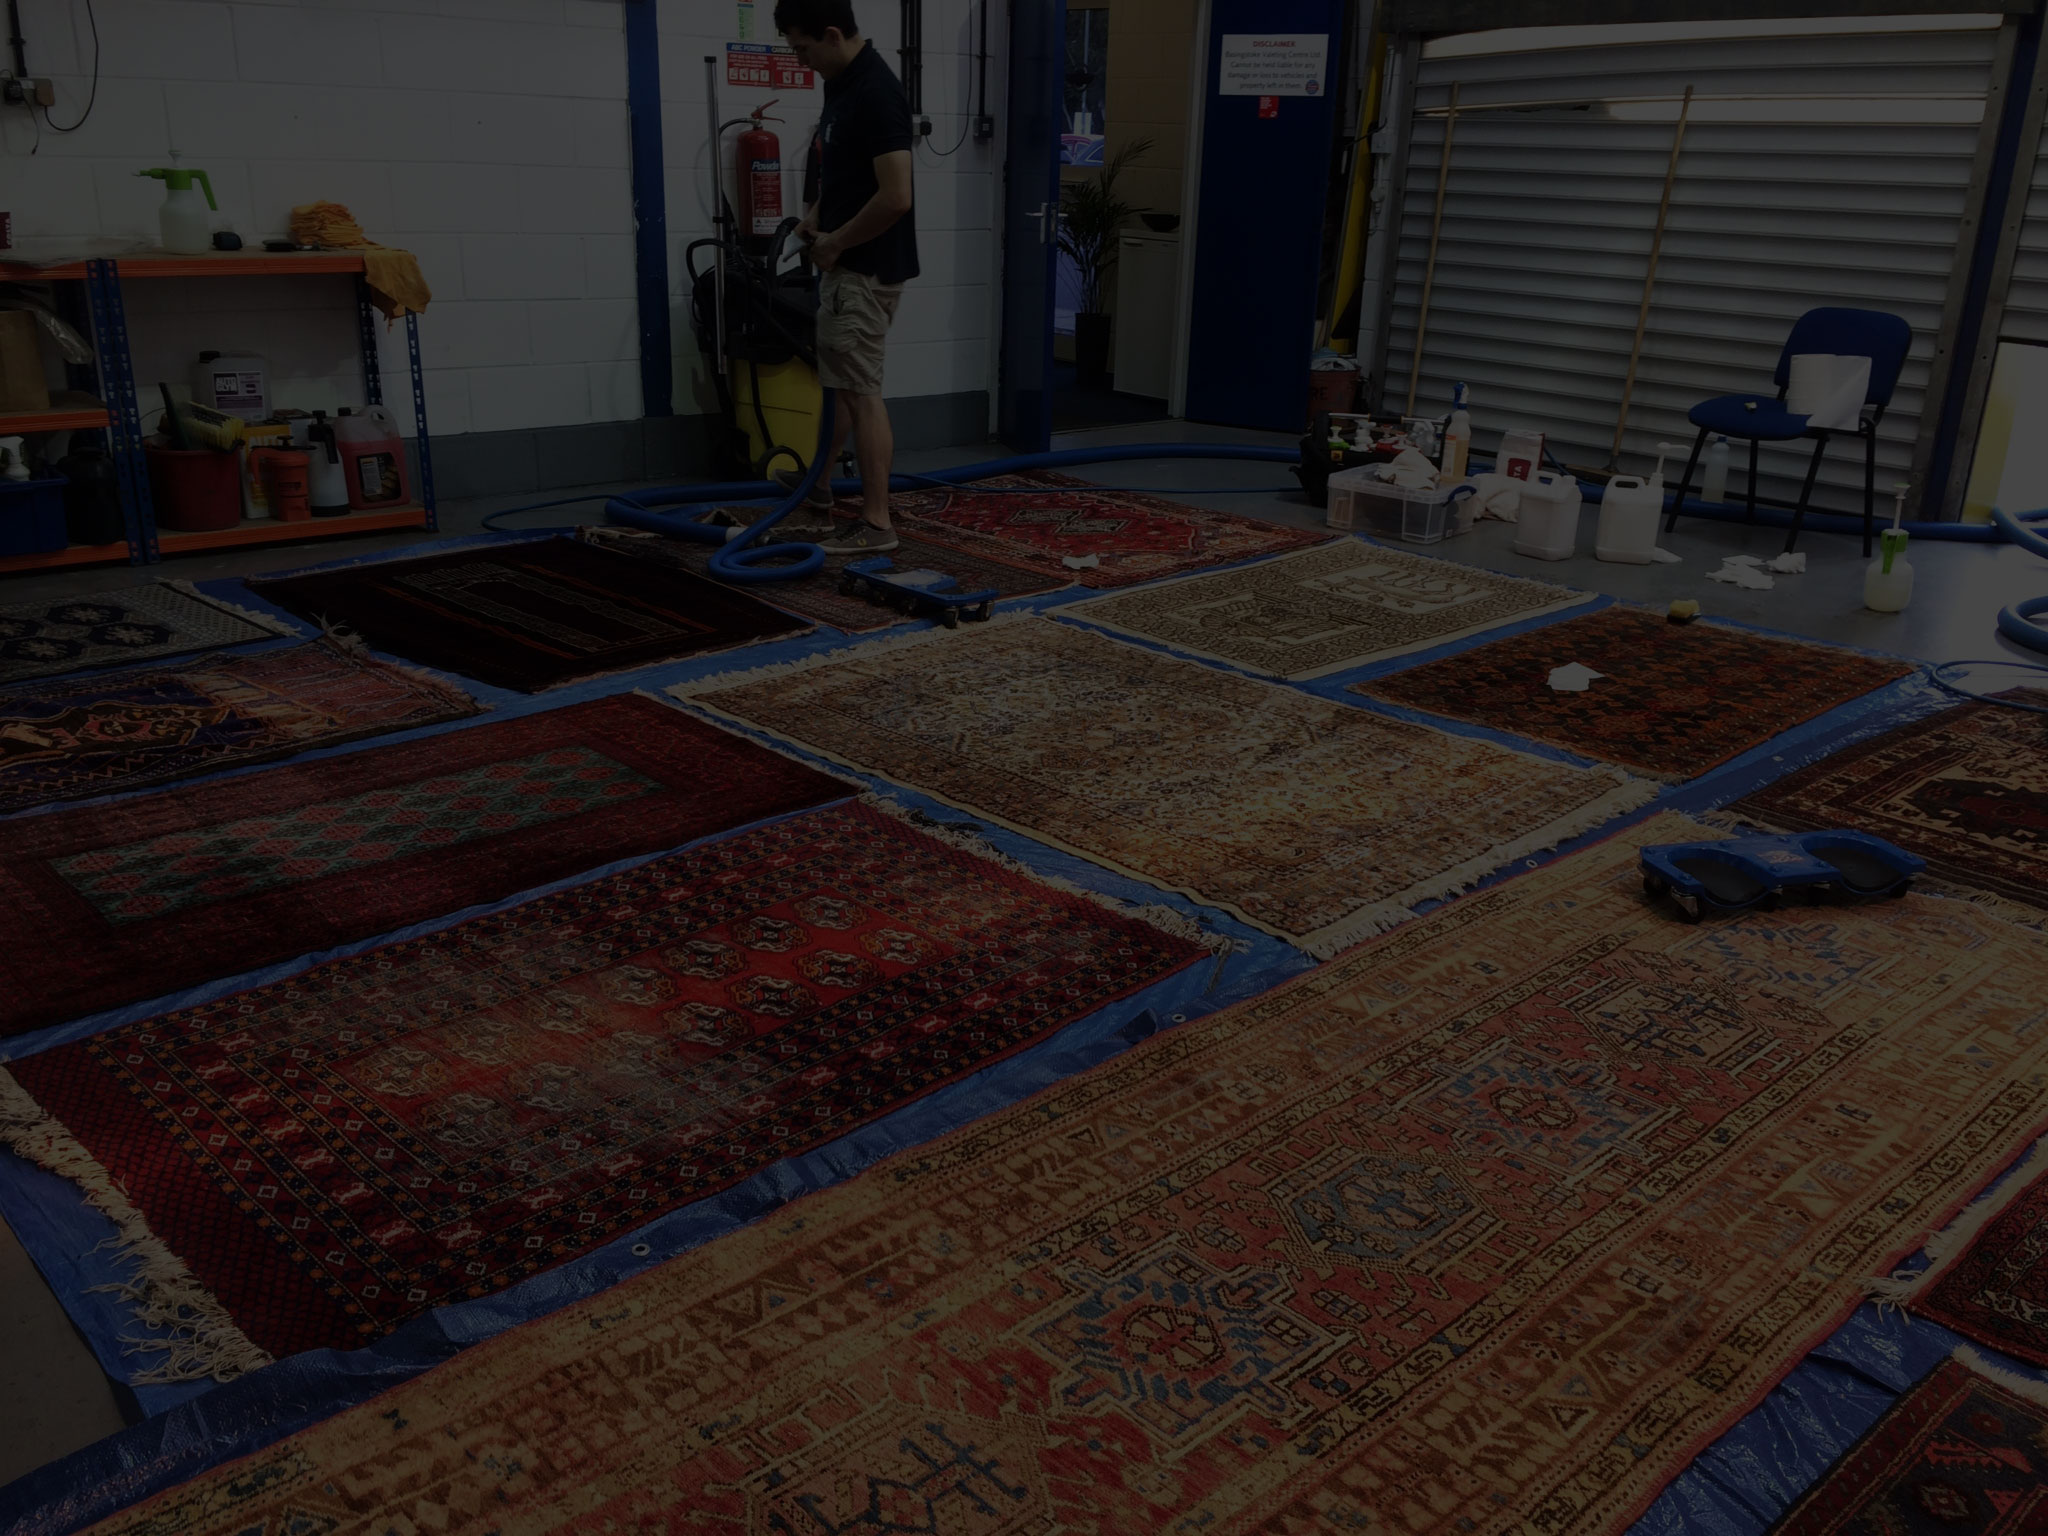 South Beach Rug Cleaning Carpet Cleaning Miami Beach Fl